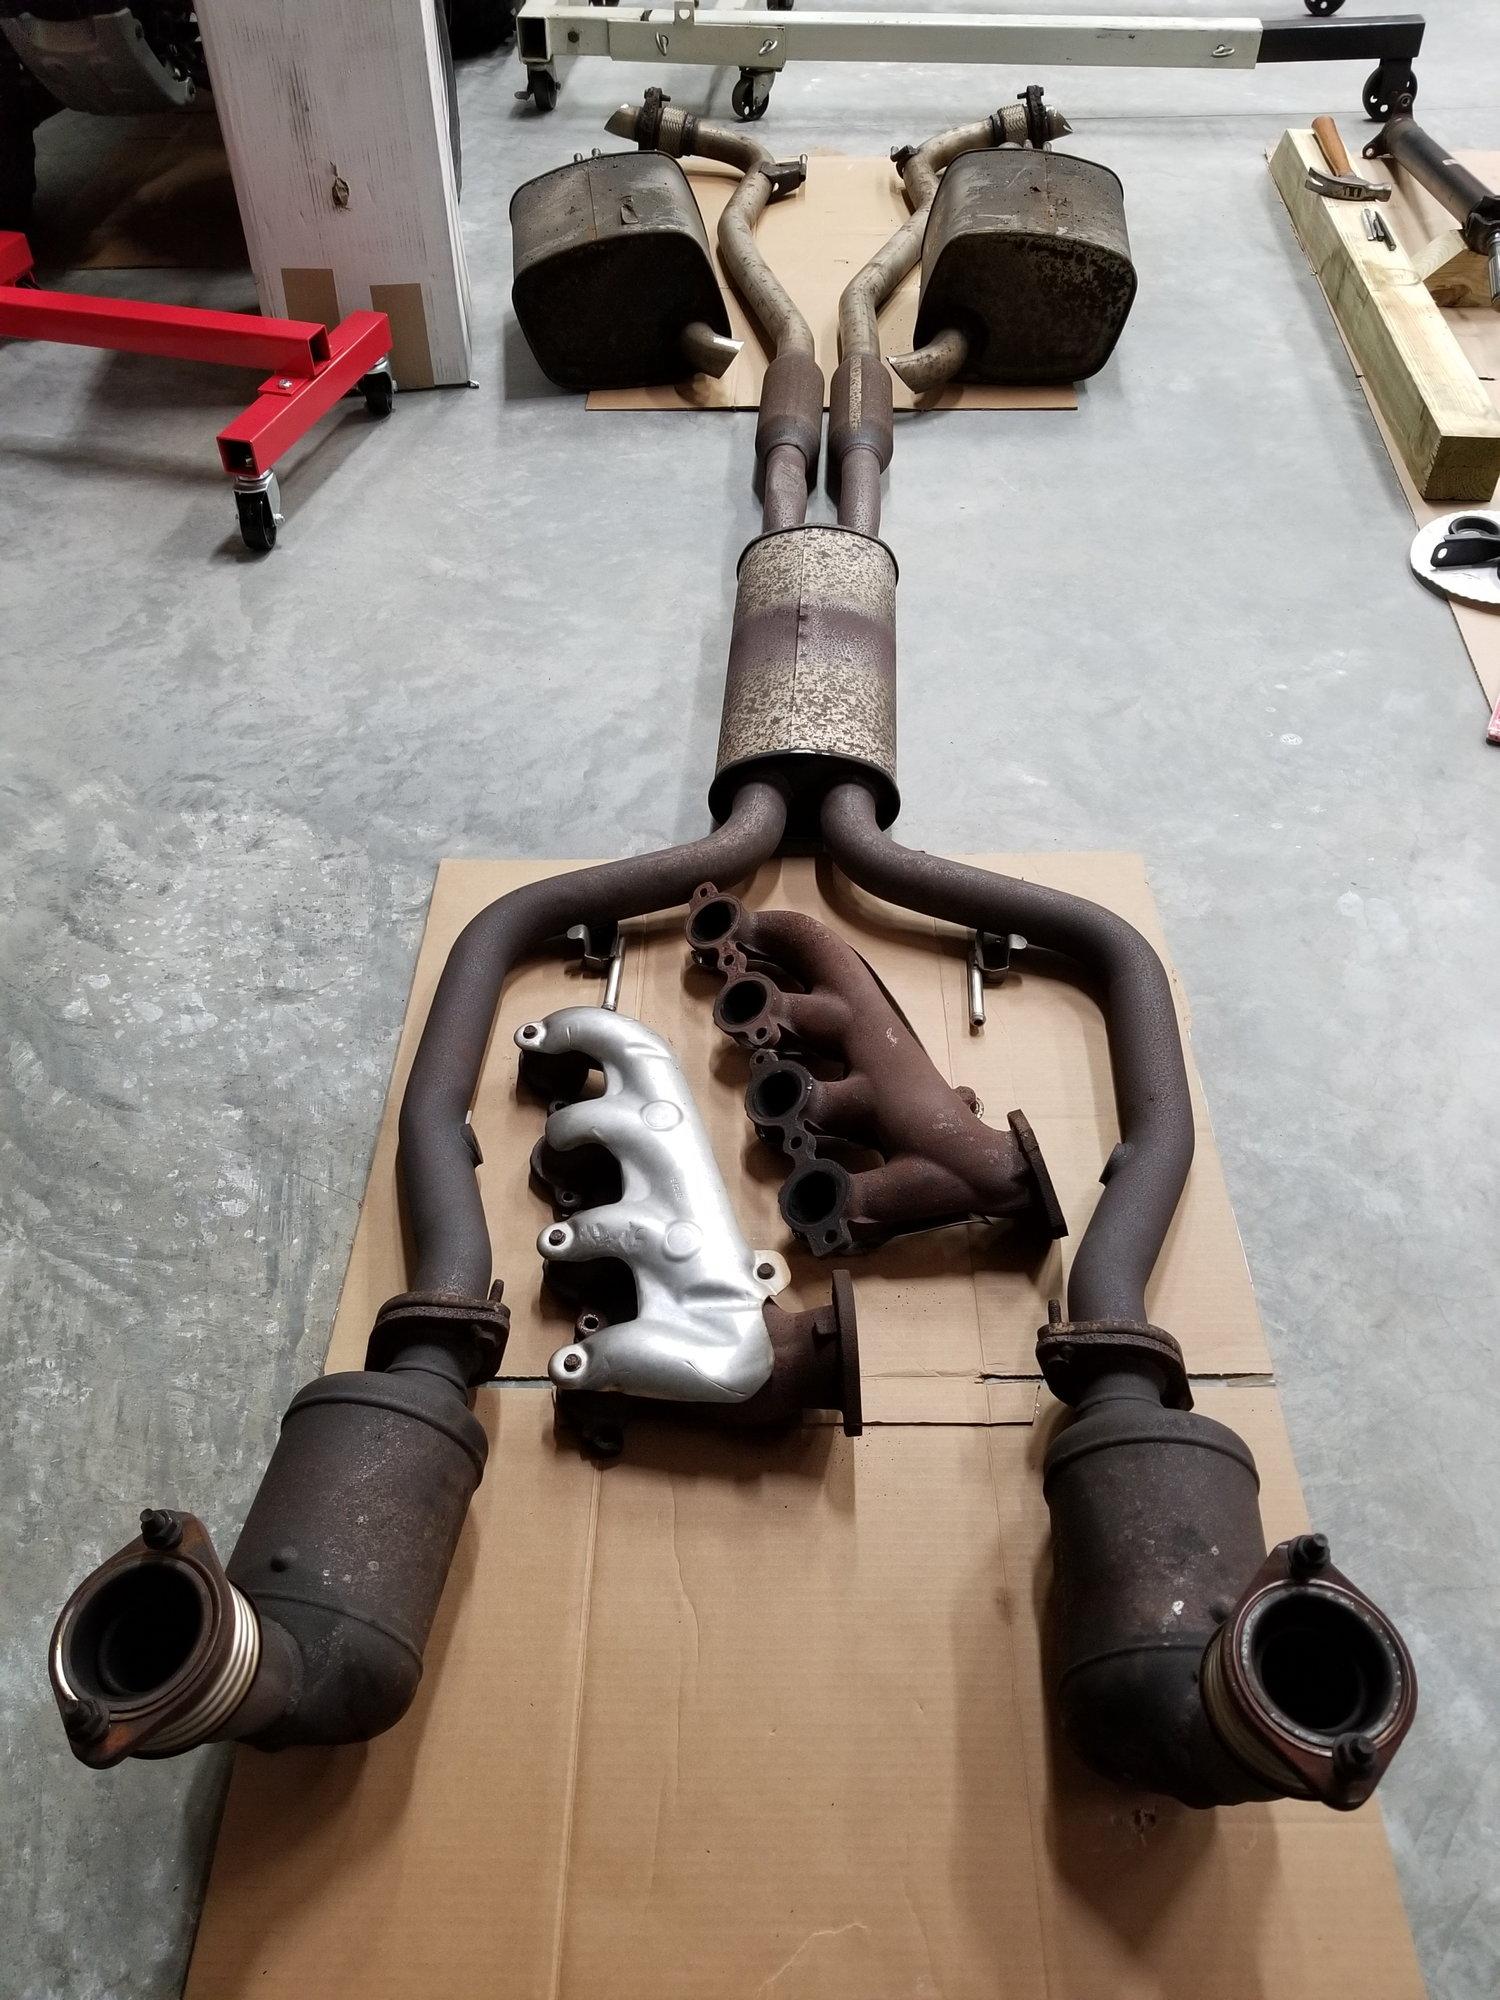 2009 pontiac g8 gt 6 0 l76 ls2 complete exhaust